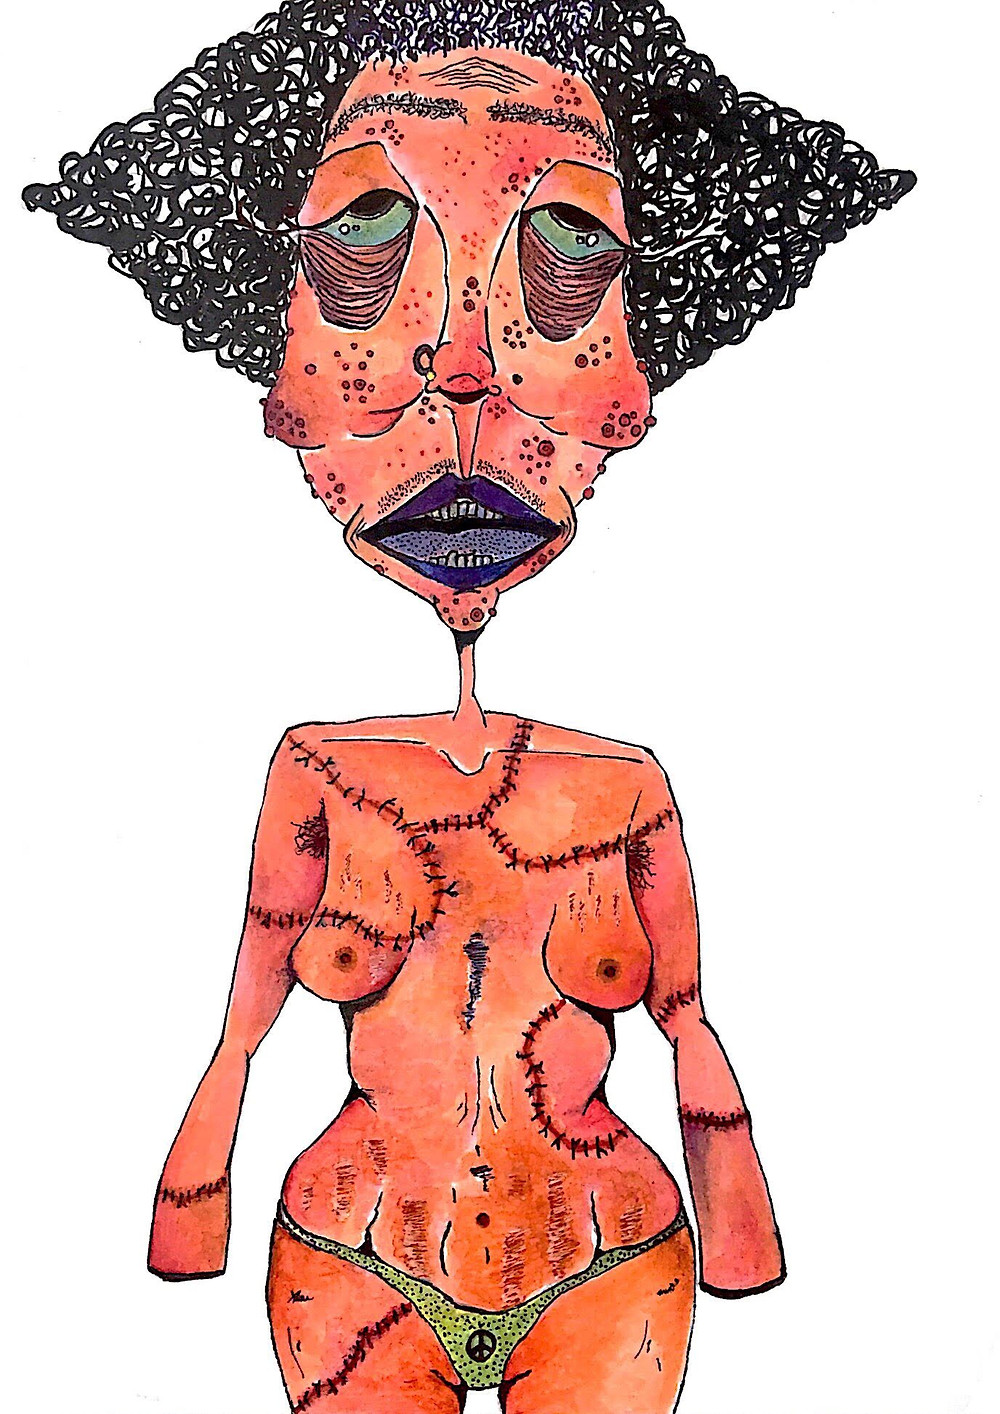 fashion designer and artist Pratiksha Tandon's artwork of a suffering woman